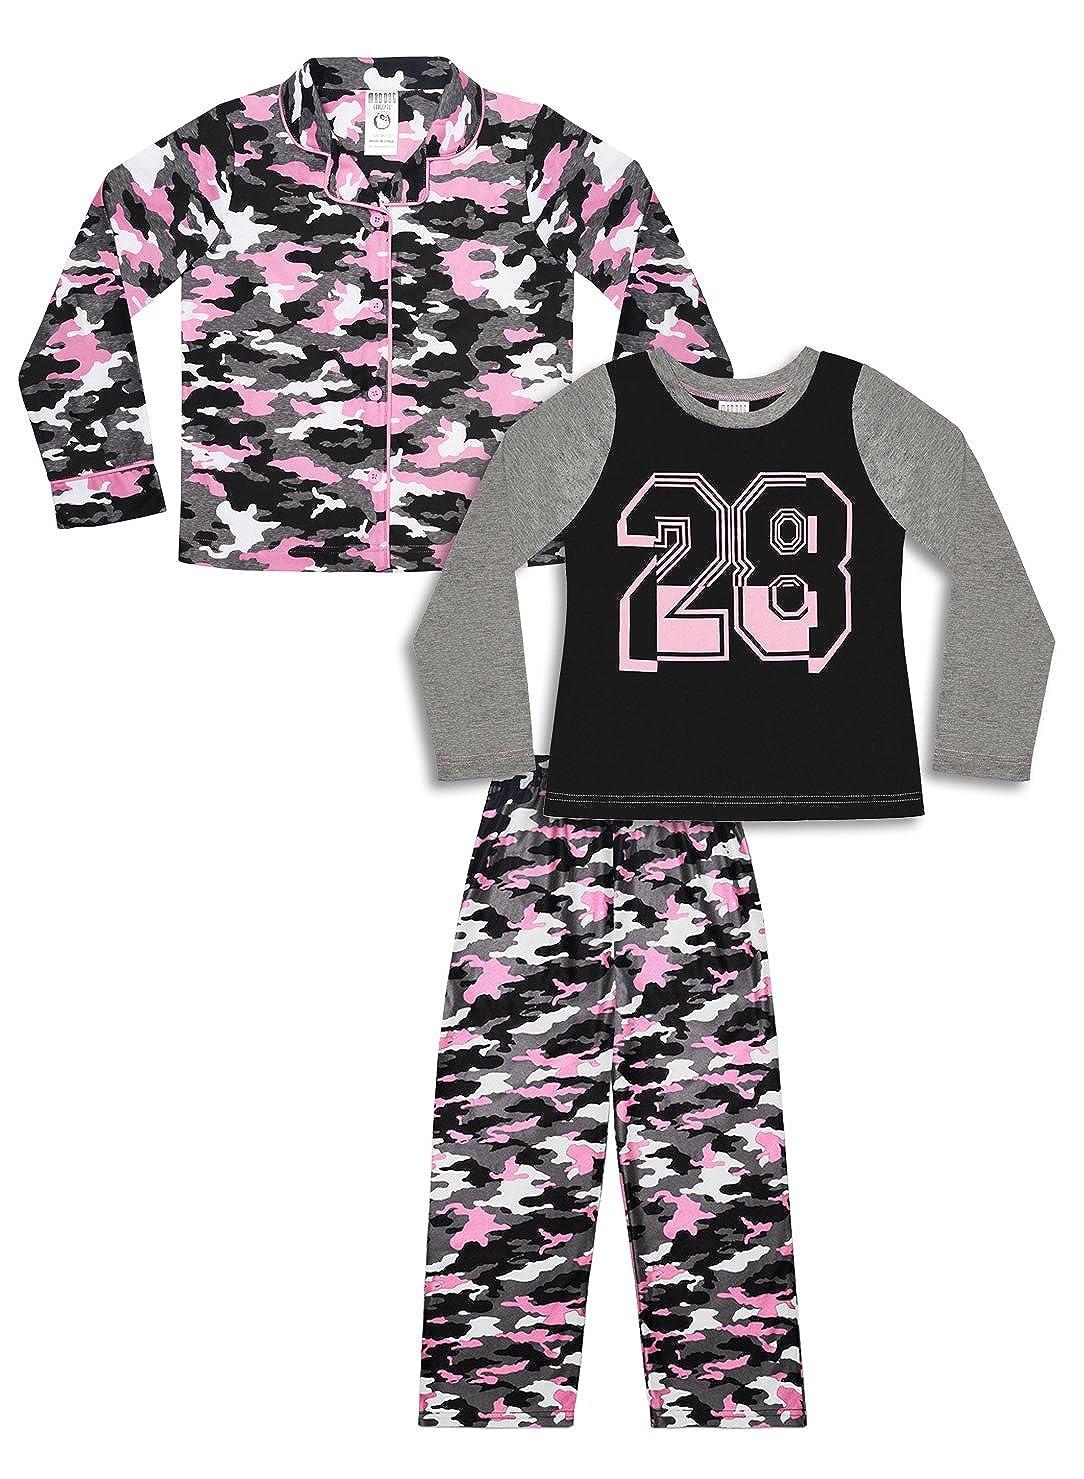 111fe8f95 Amazon.com  Girl s 3 Piece Pajama Set - Pink Dog and Camo Print ...